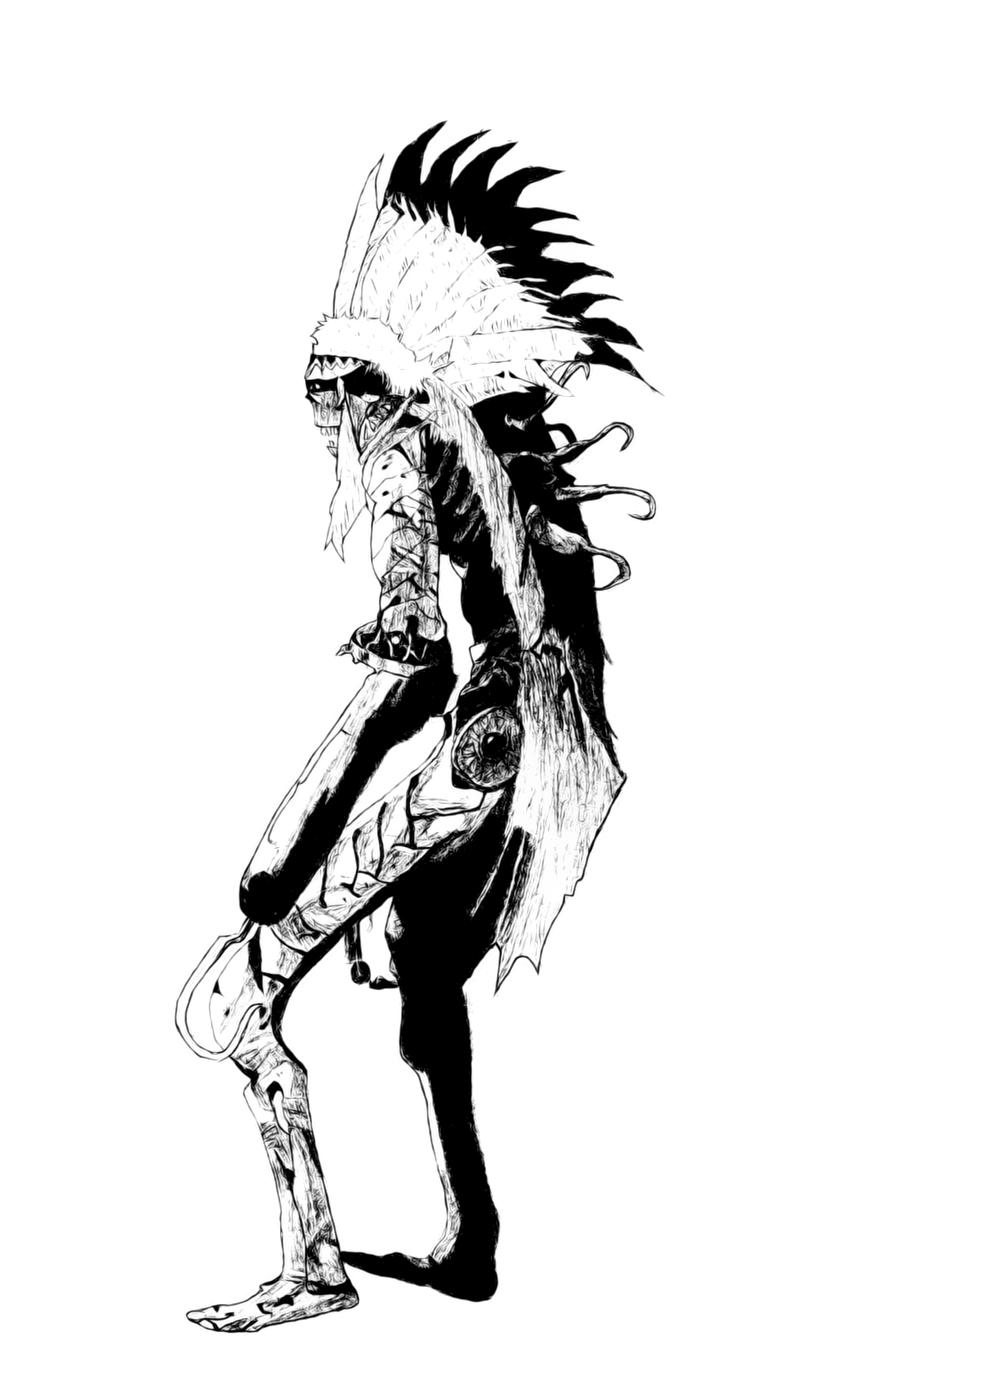 Zellogi - Death Note's Wiki